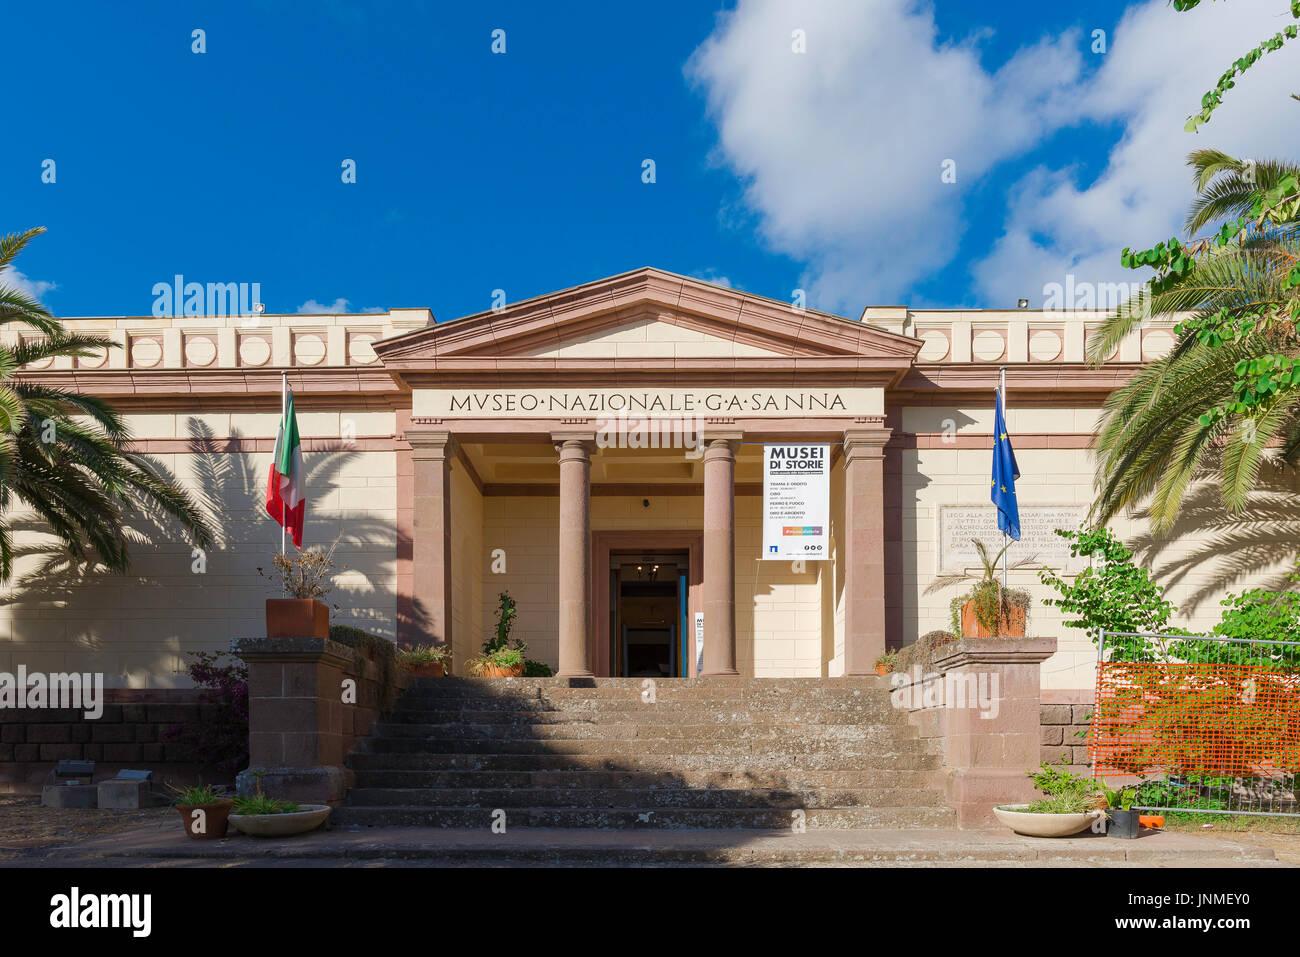 Sassari Sardinia museum, neoclassical facade of the Museo Sanna in Sassari, Sardinia's second most important archaeological museum. - Stock Image